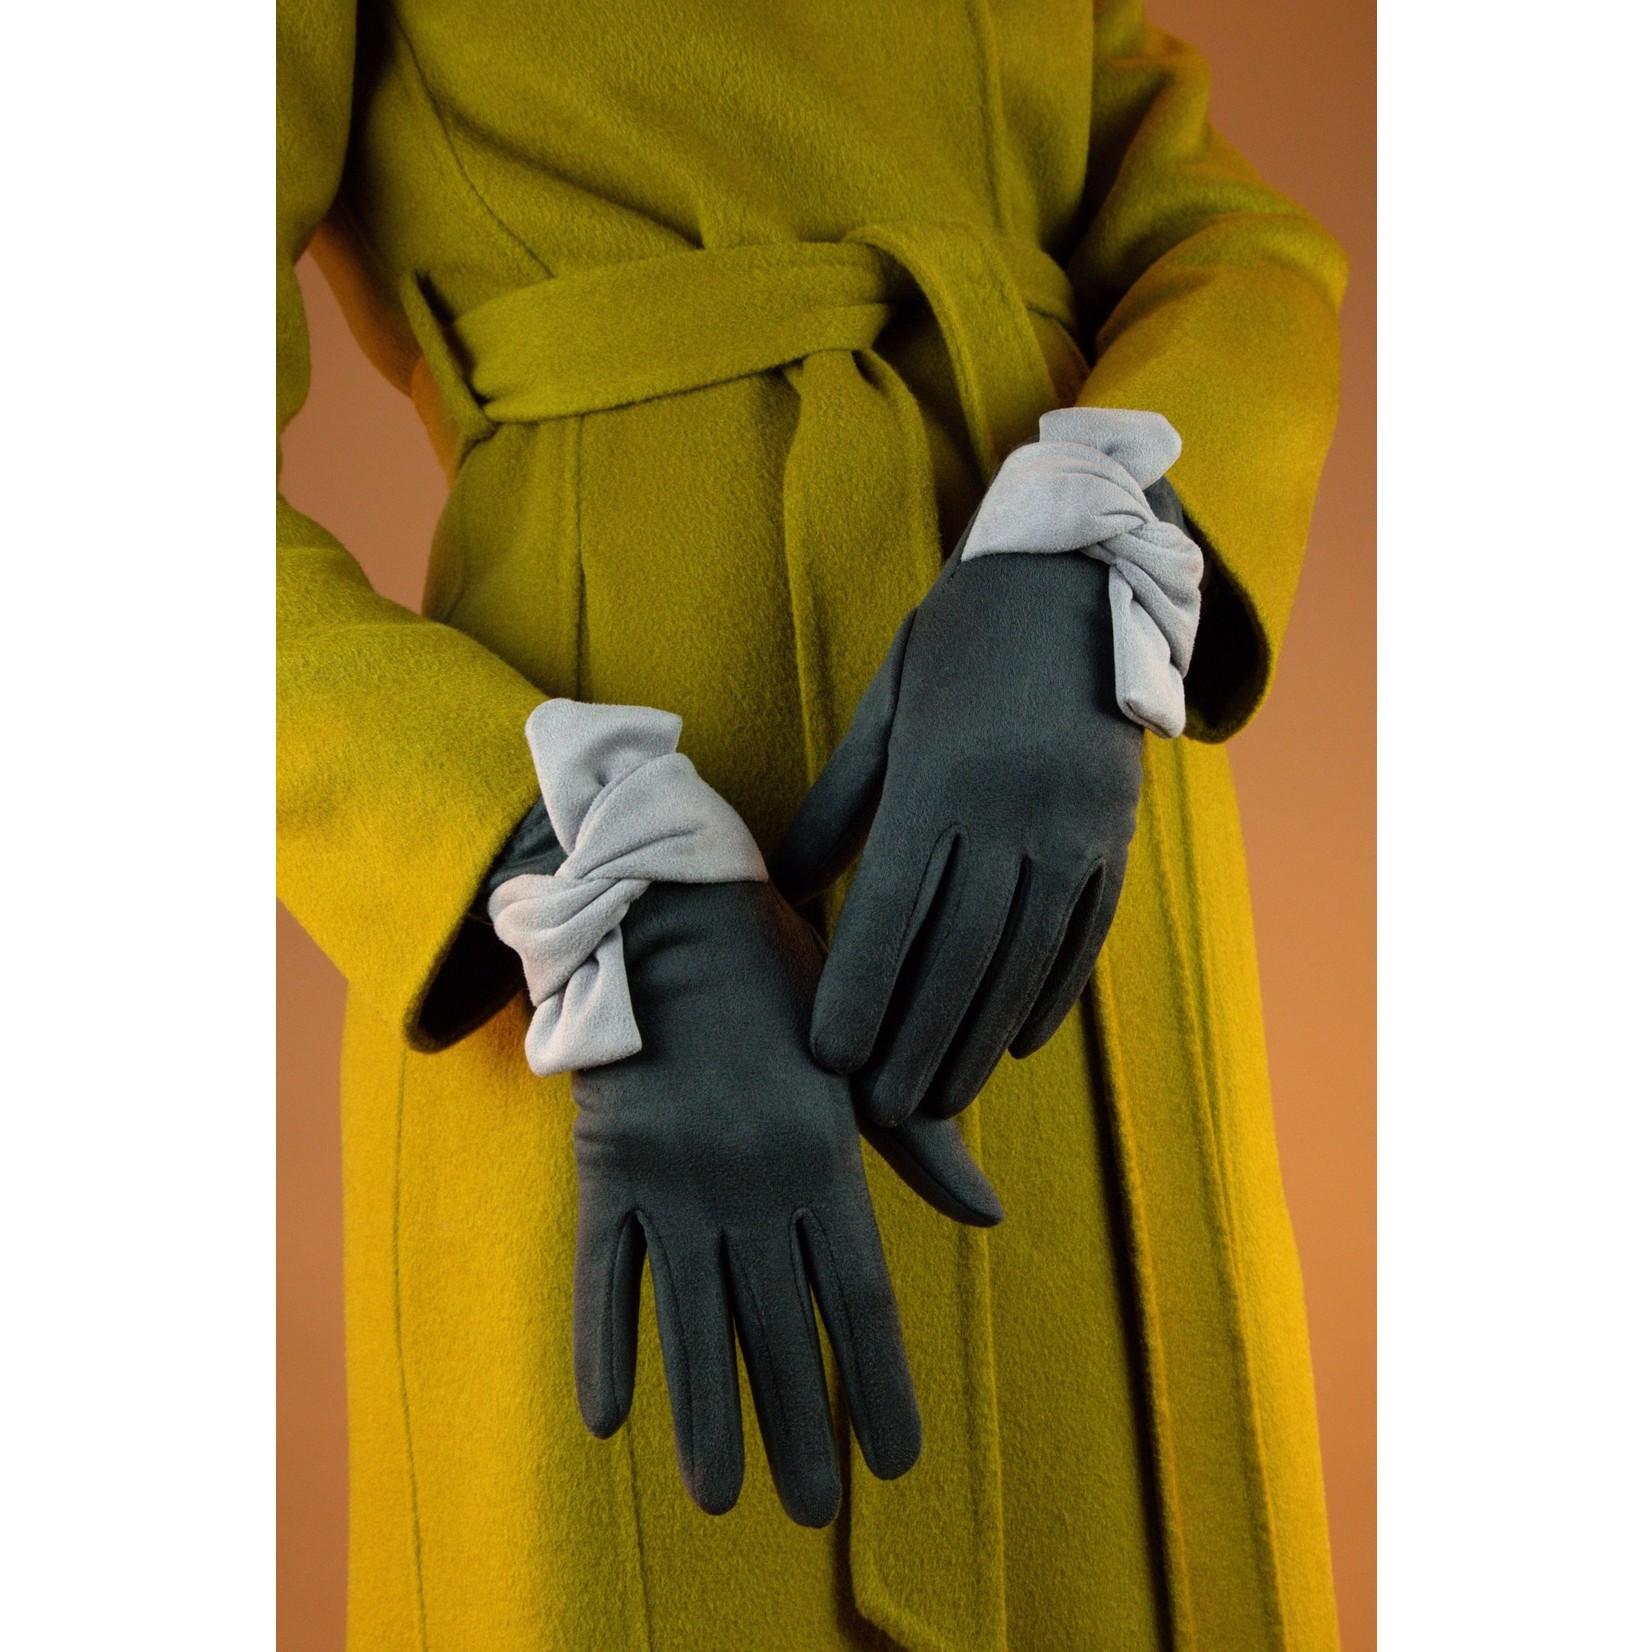 Powder Henrietta Faux Suede Twist Trim Gloves in CharcoaL/Slate